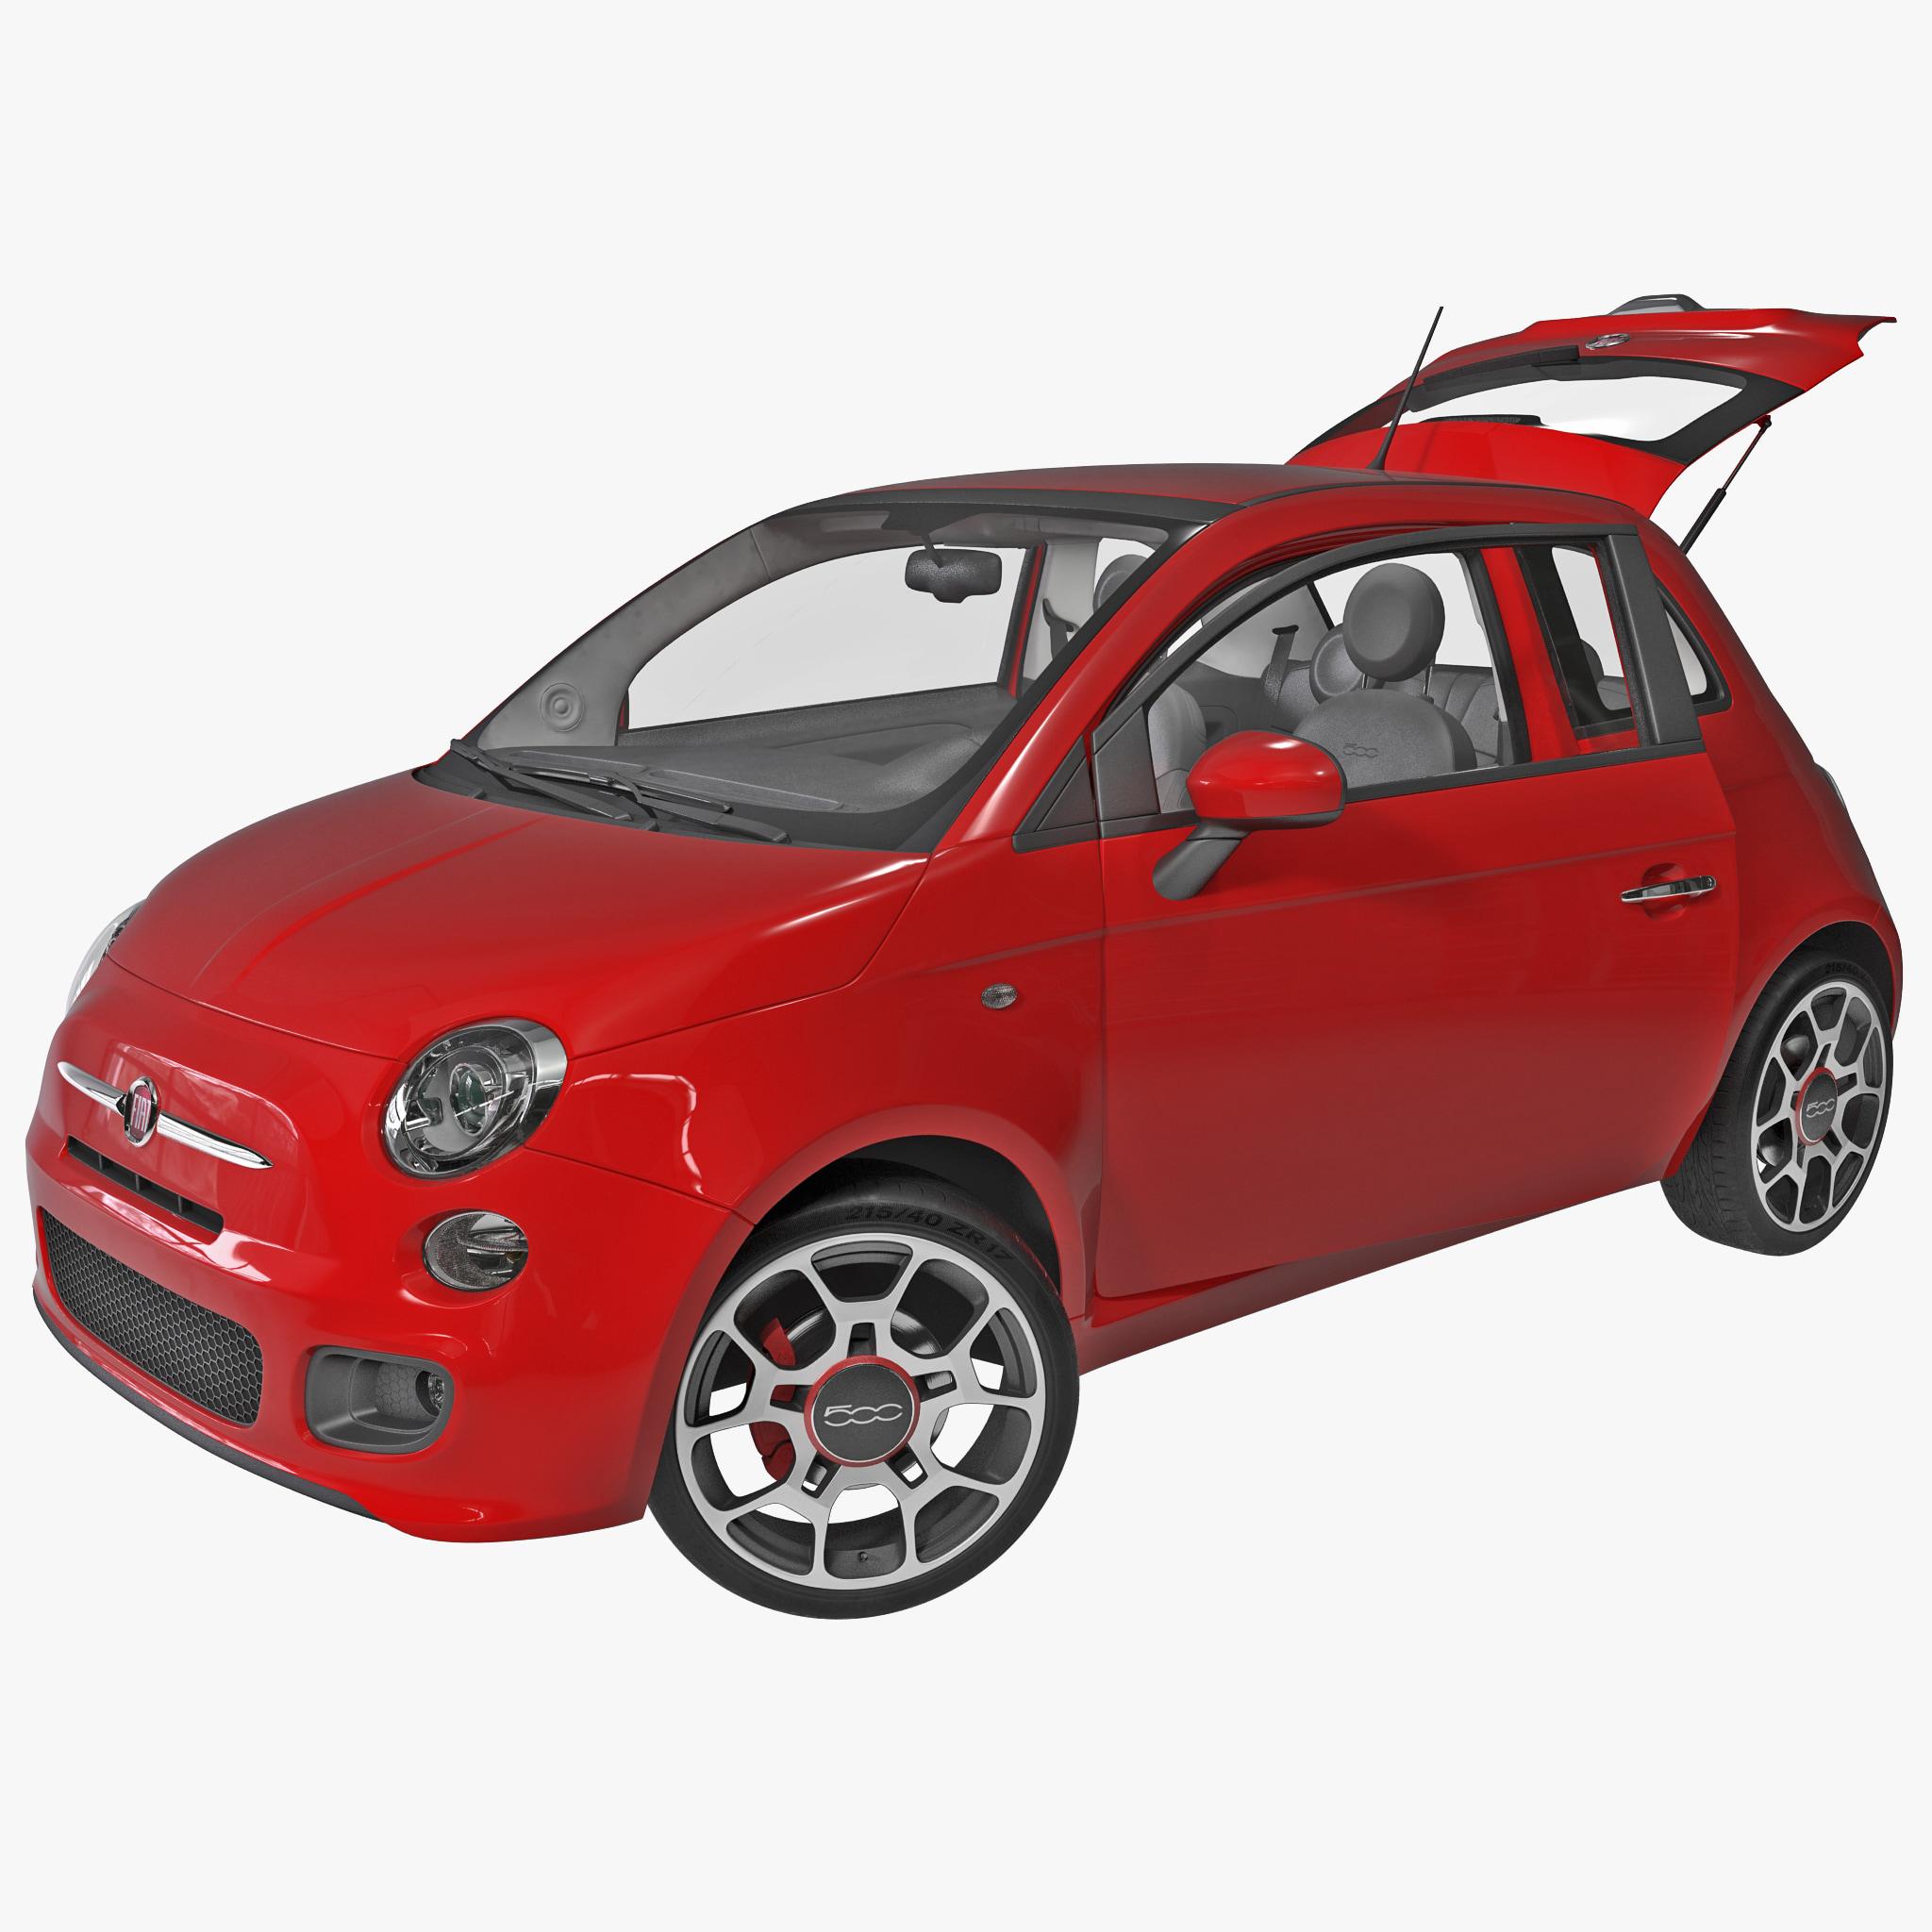 Fiat Convertible 500 2014 Rigged_1.jpg